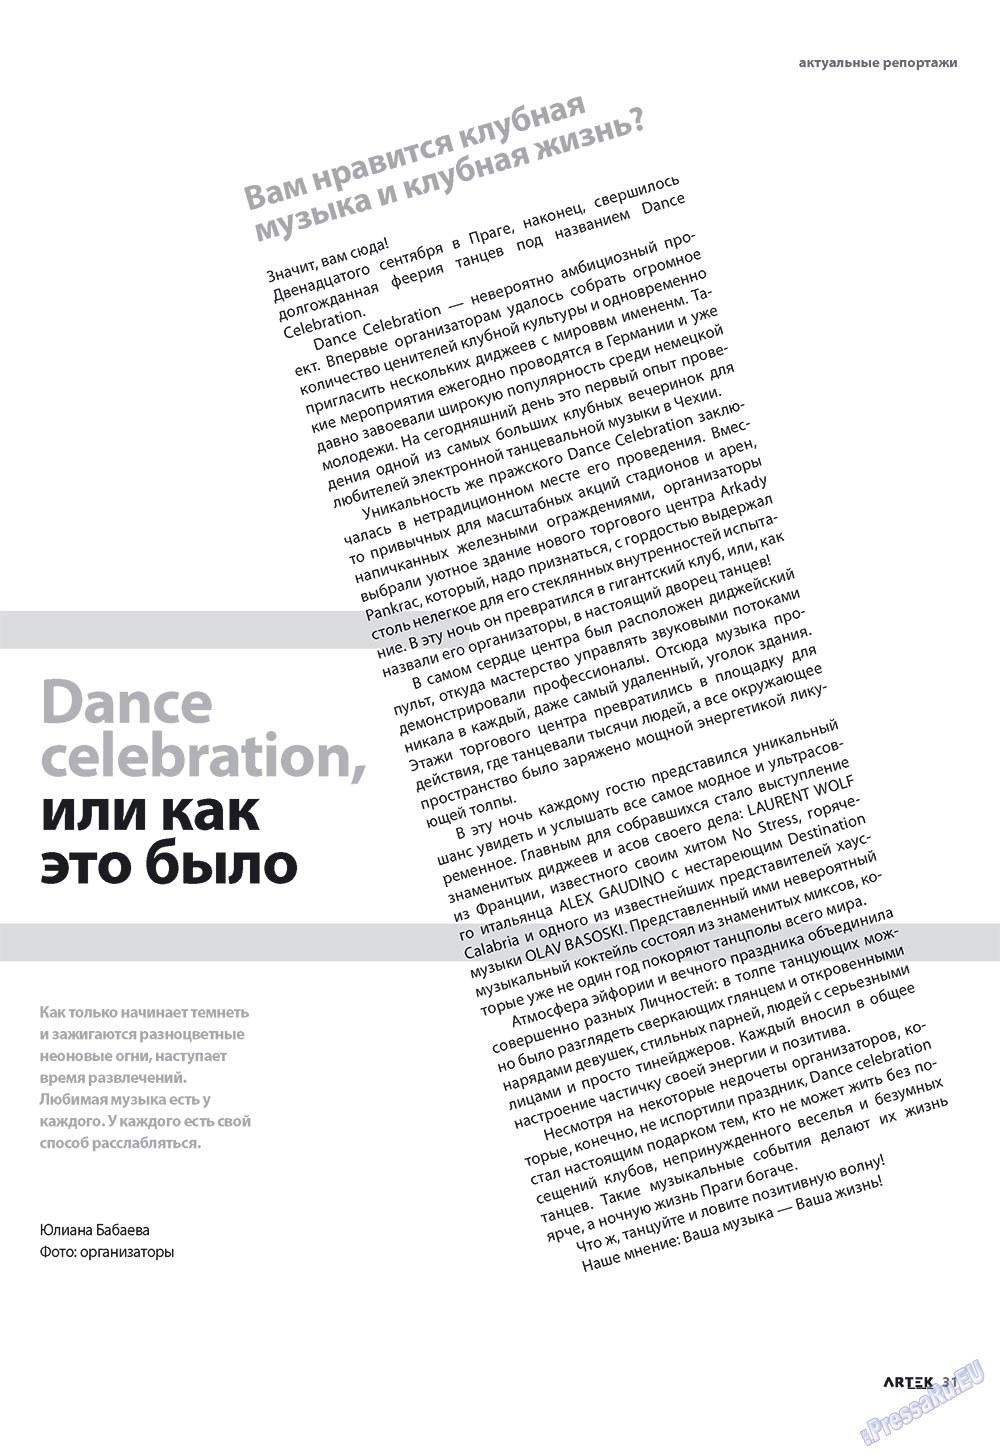 Артек (журнал). 2009 год, номер 4, стр. 31